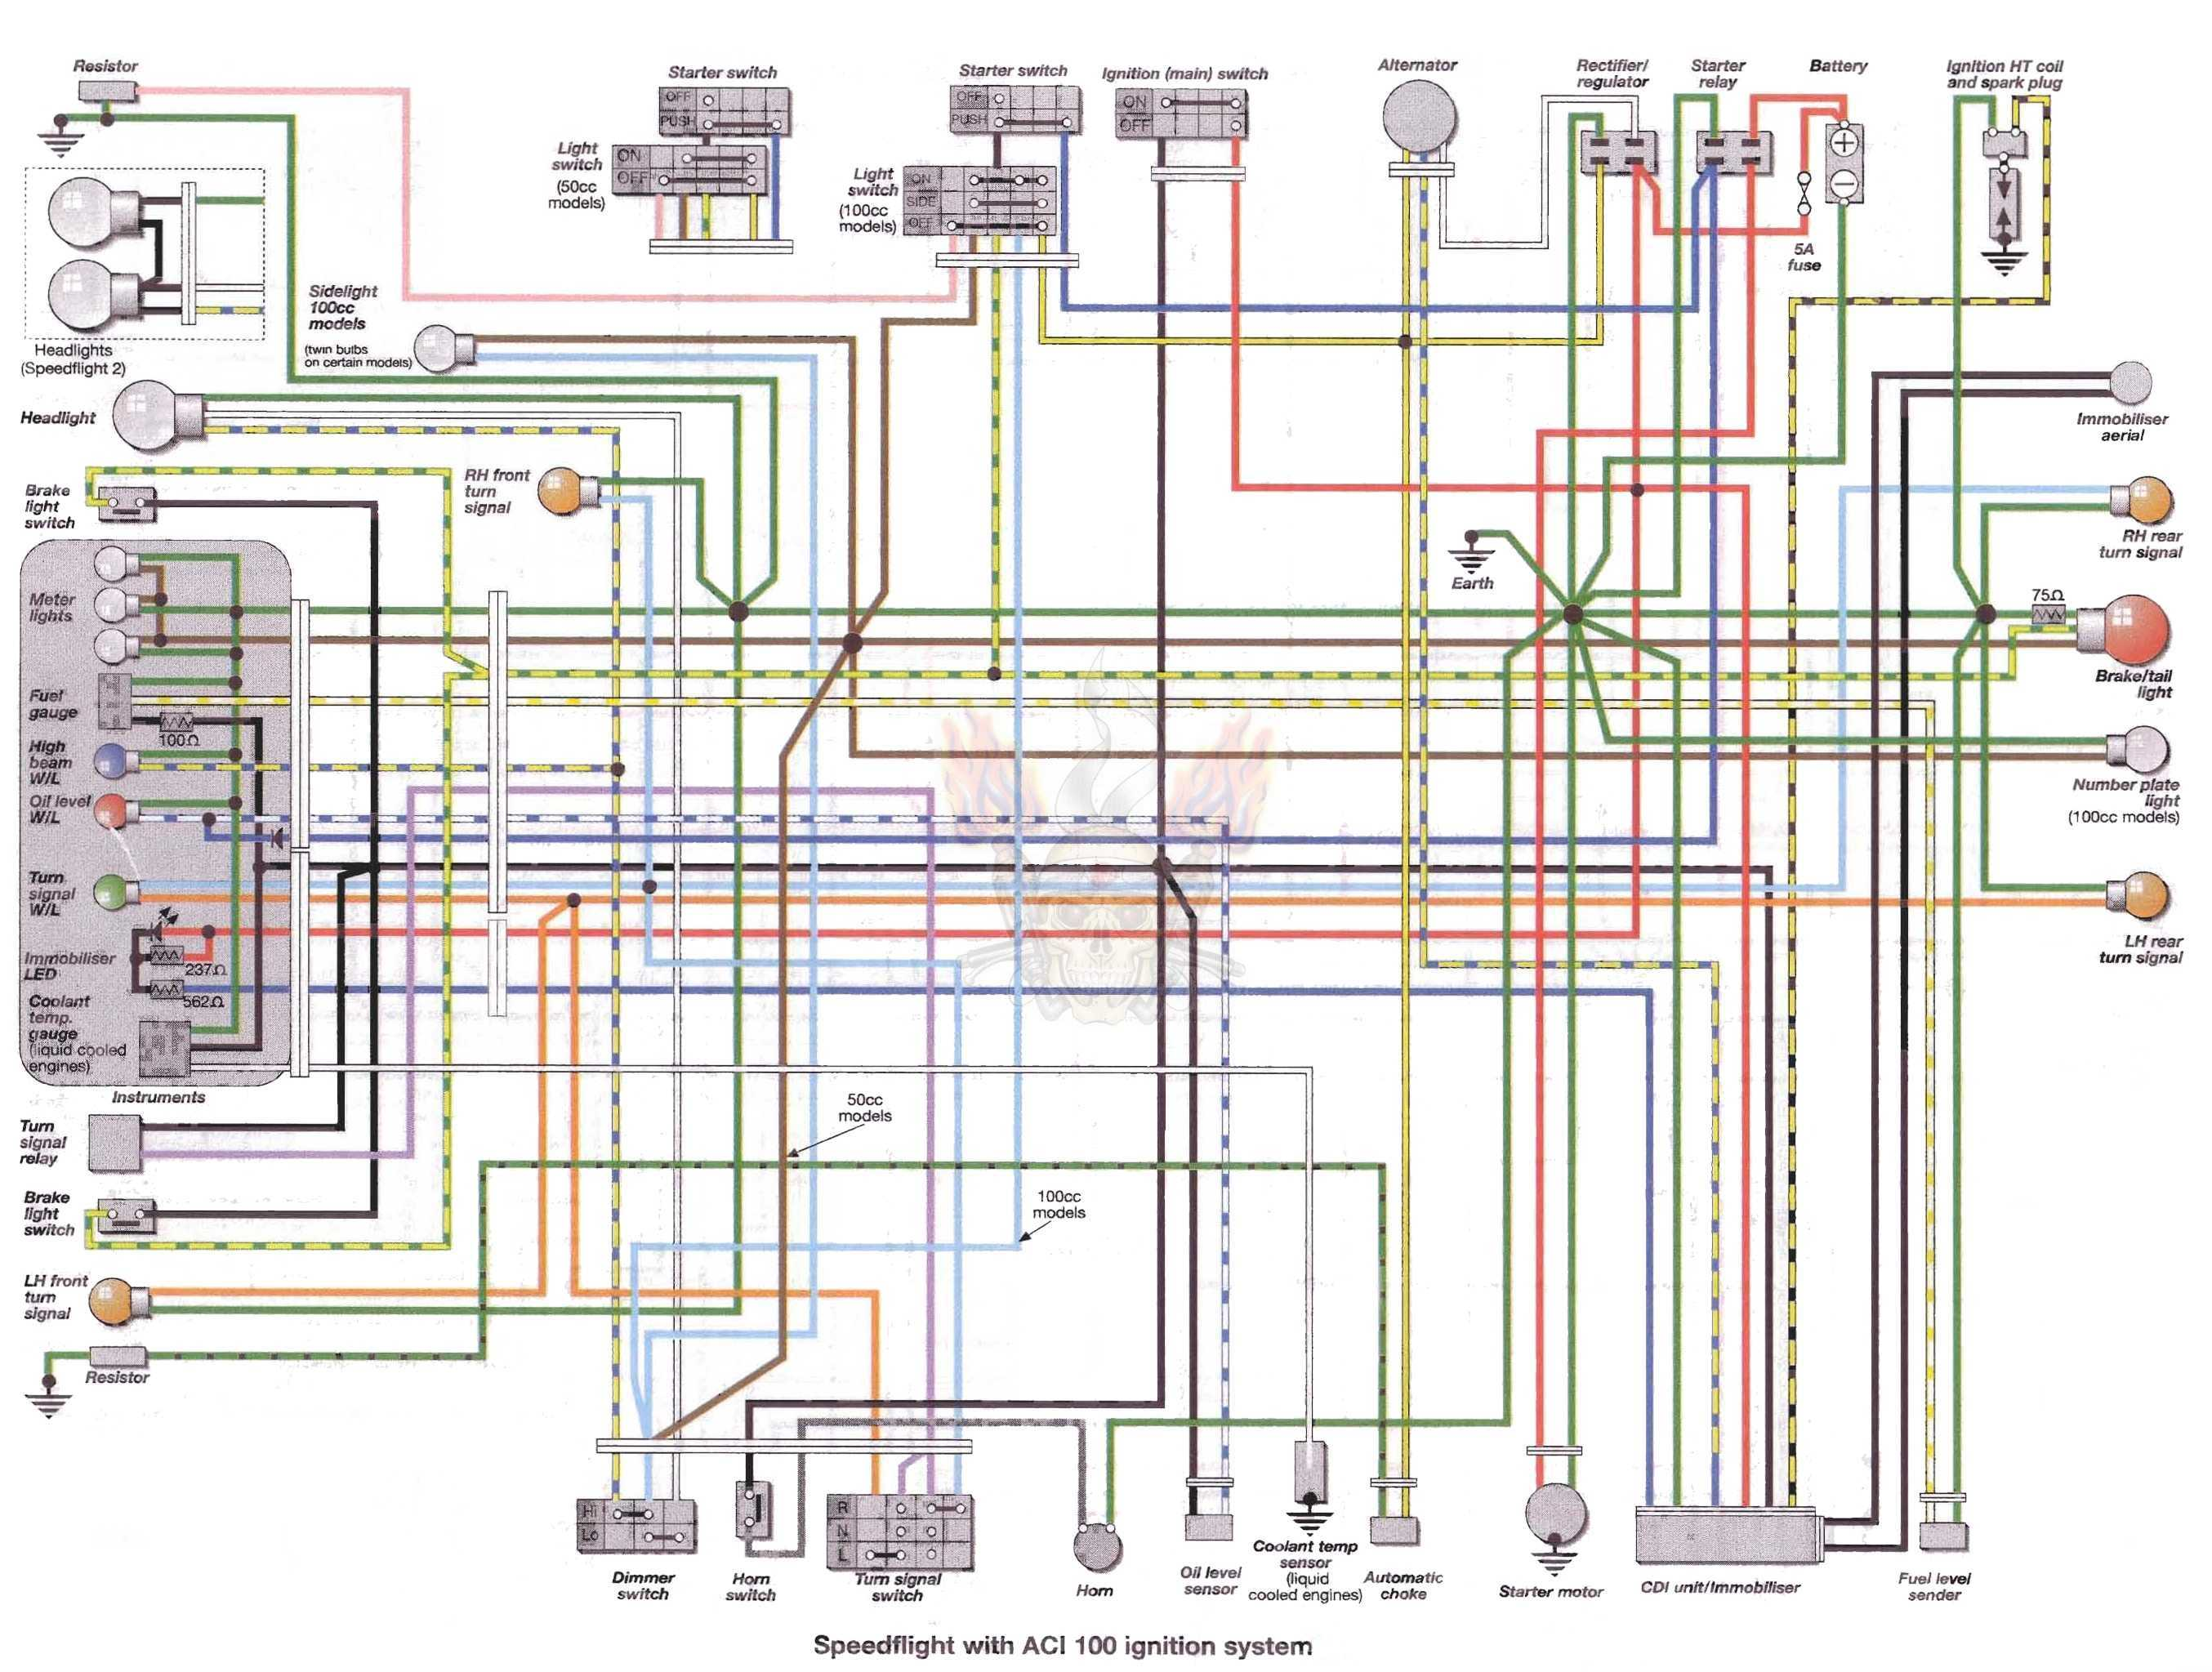 simple wiring diagram for kz1000 wiring diagram specialtieskz1000 wiring  diagram basic best wiring librarypeugeot vivacity wiring